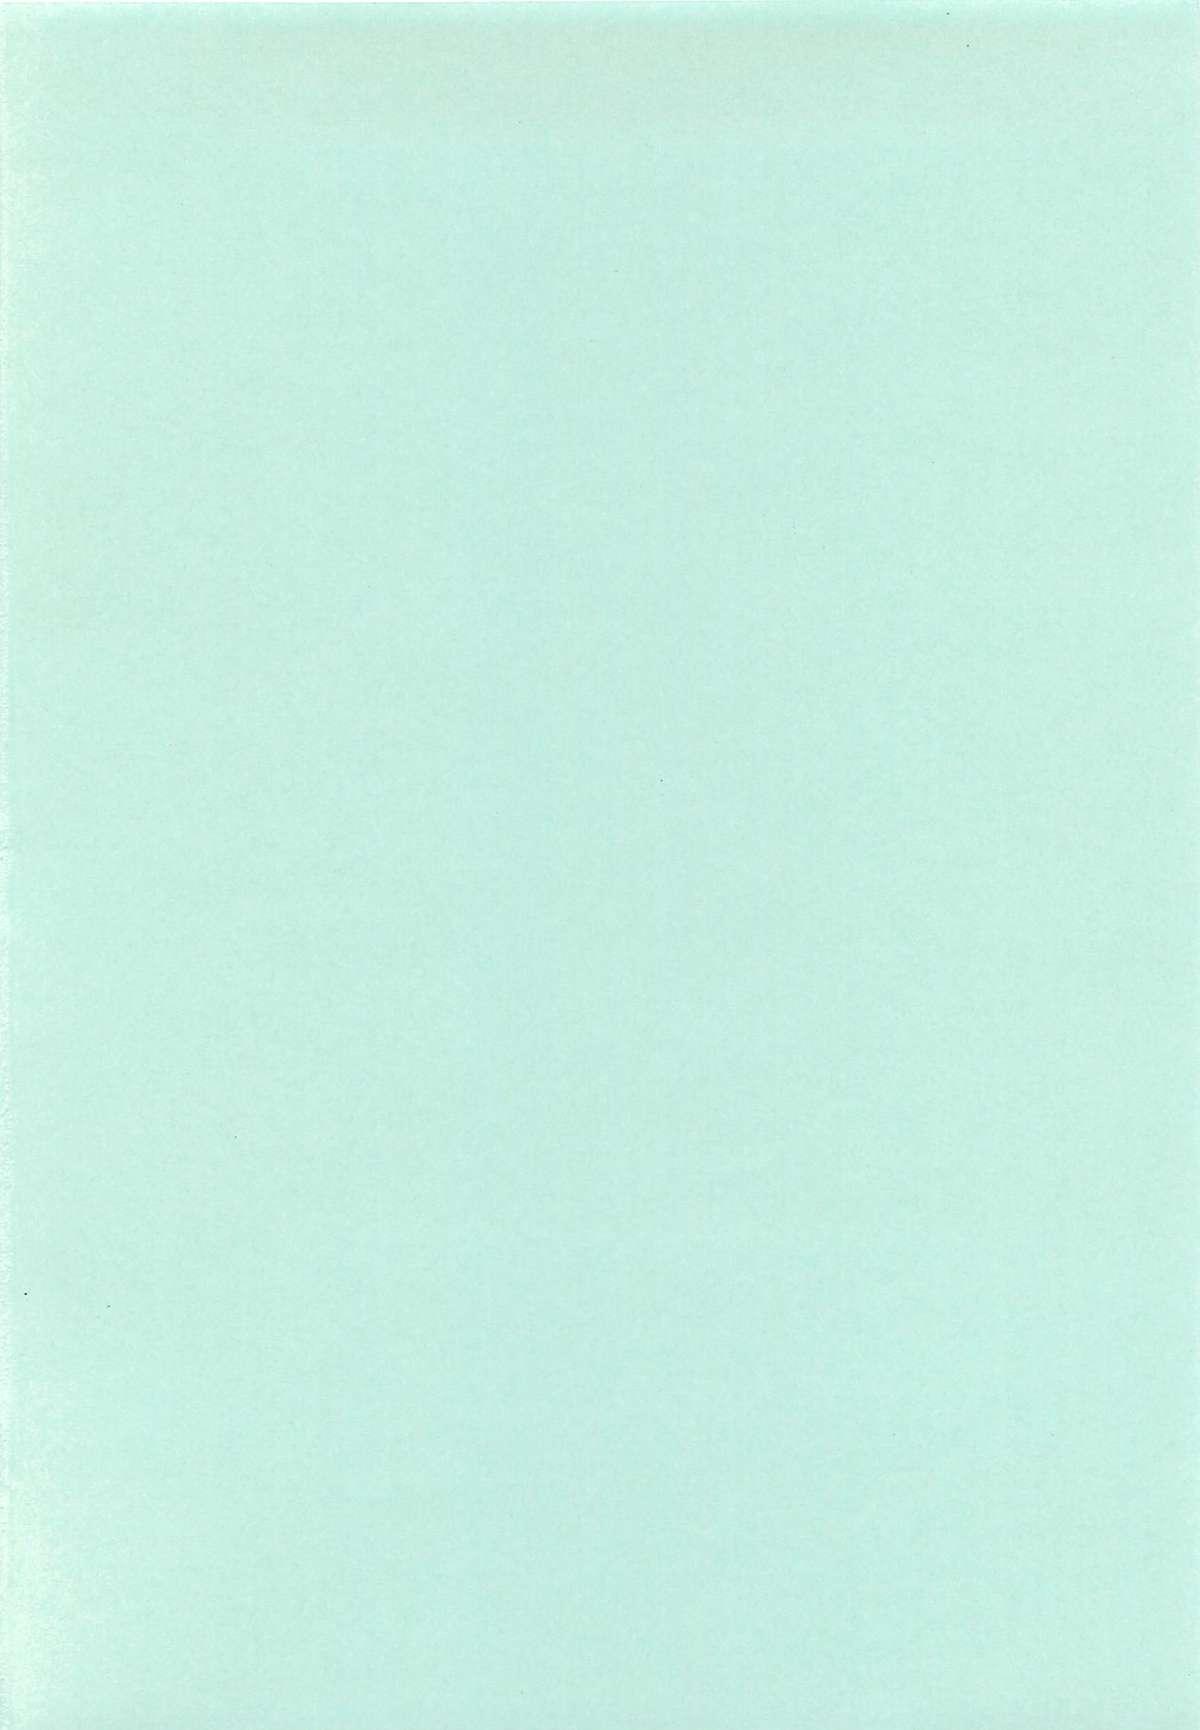 Otokonoko HEAVEN Vol. 02 Dokidoki Chikan Taiken 168